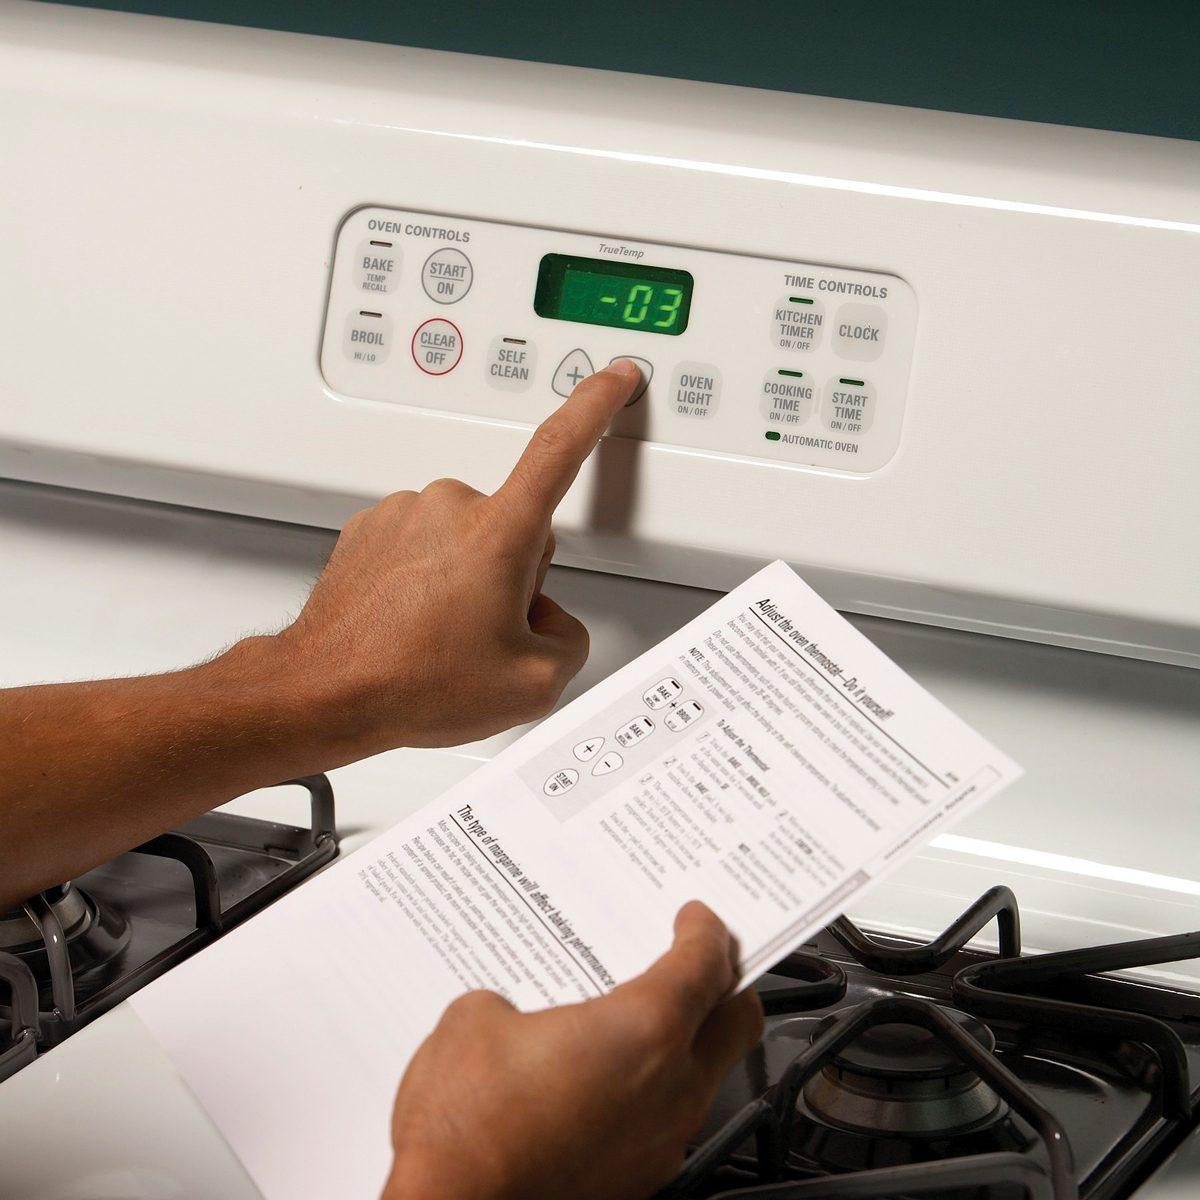 How-to-adjust-oven-temperature